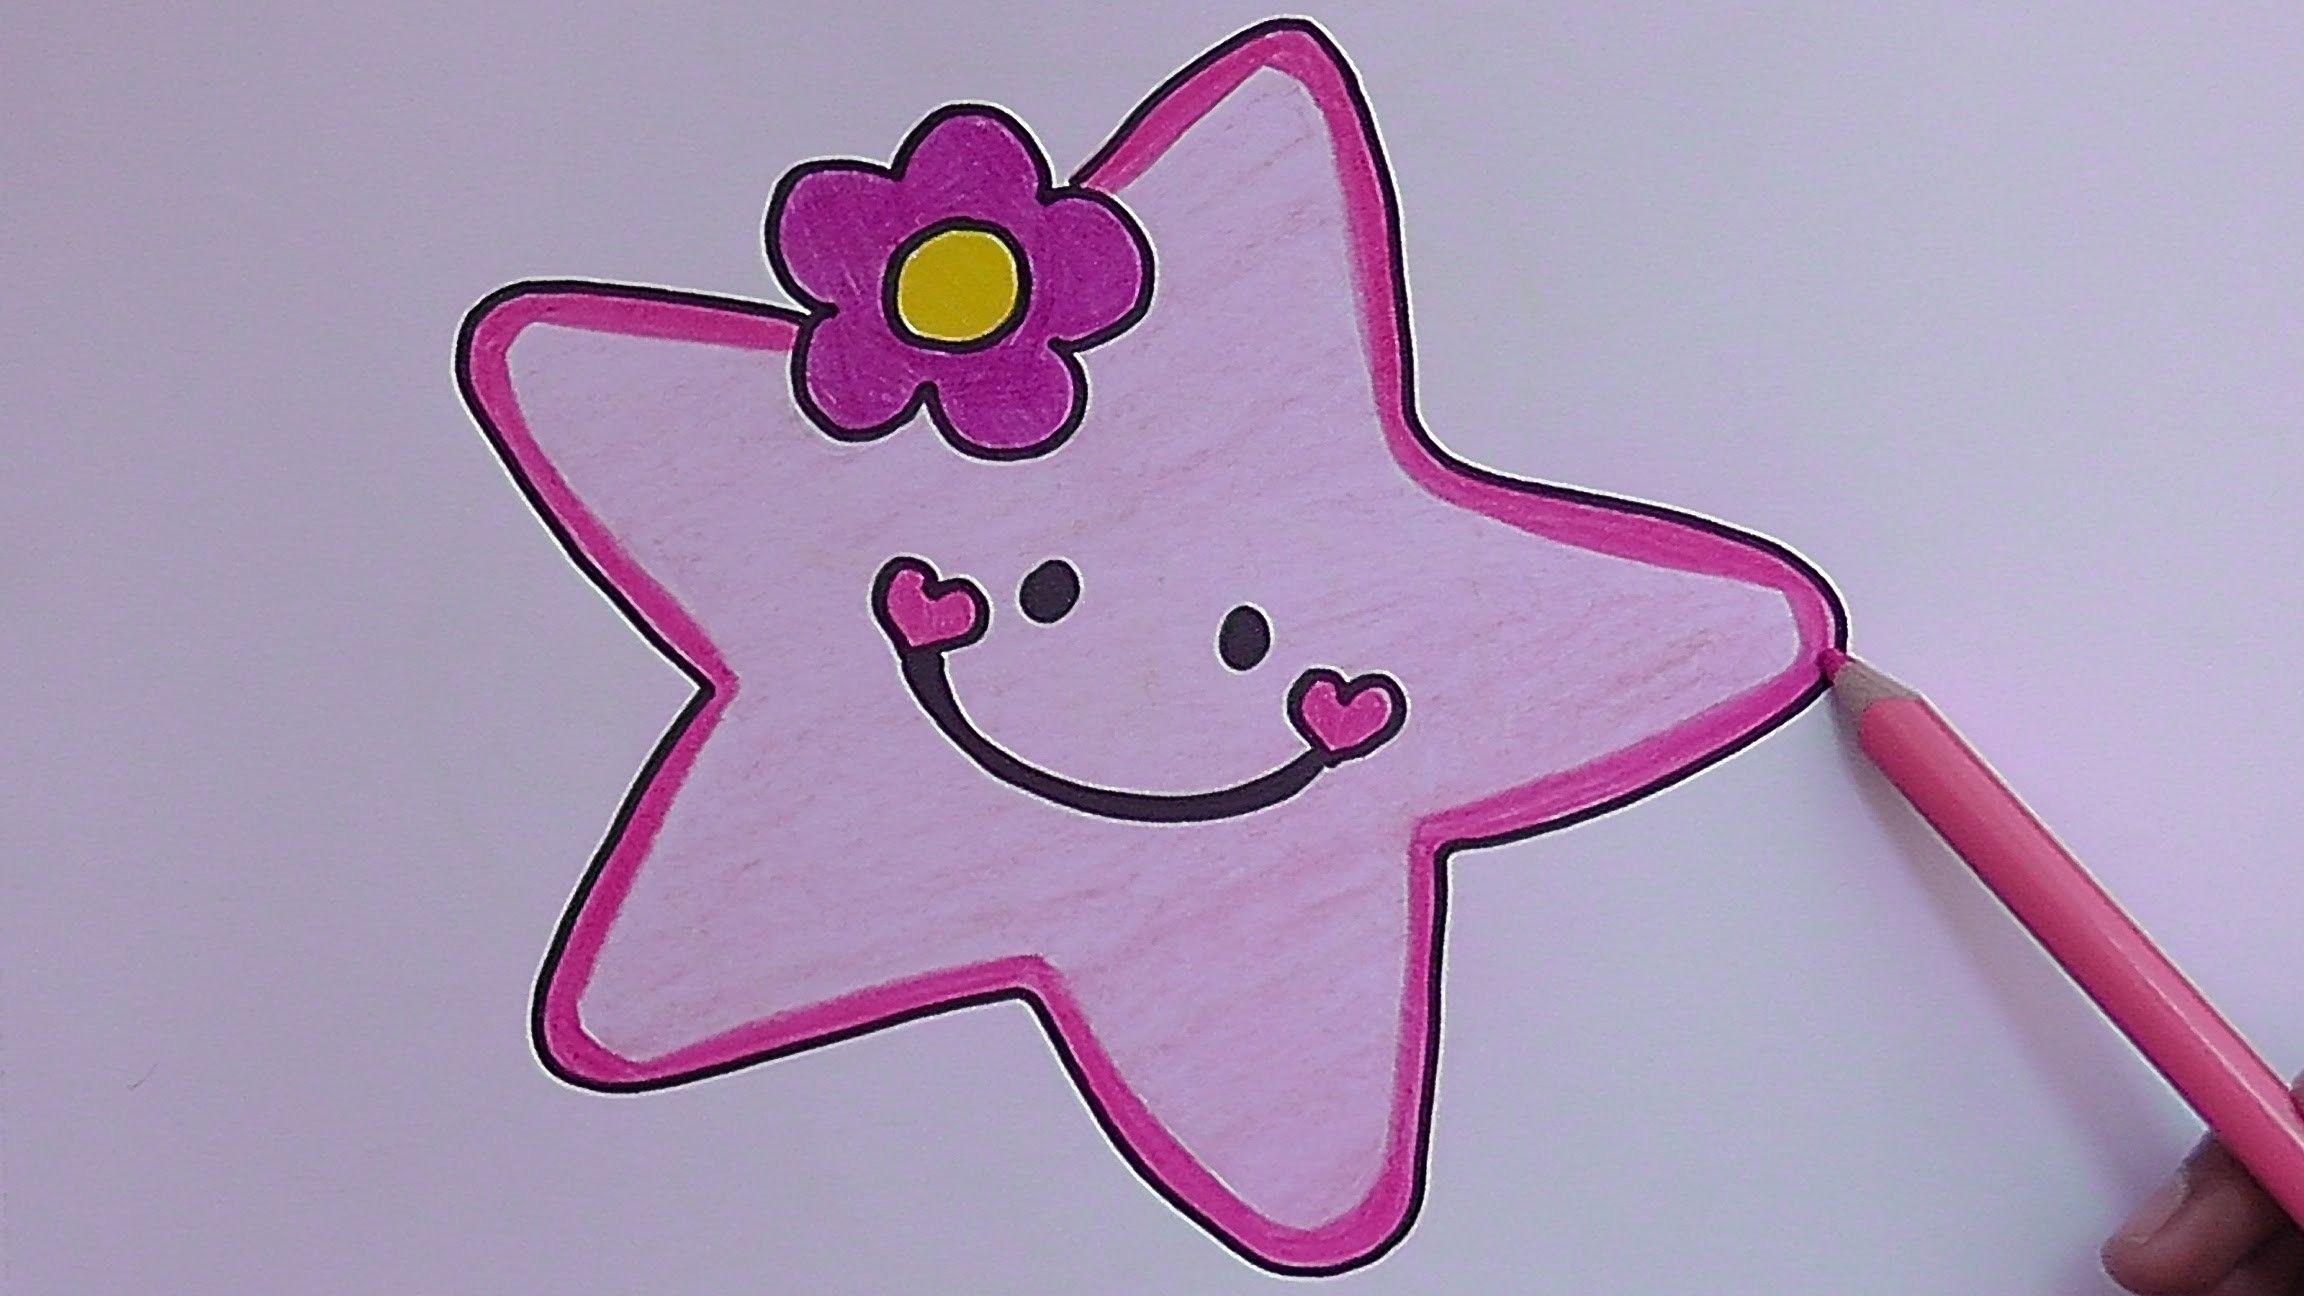 Como Dibujar Y Pintar A Estrella Rosado How To Draw And Paint Pink Star Pink Stars Drawings Painting